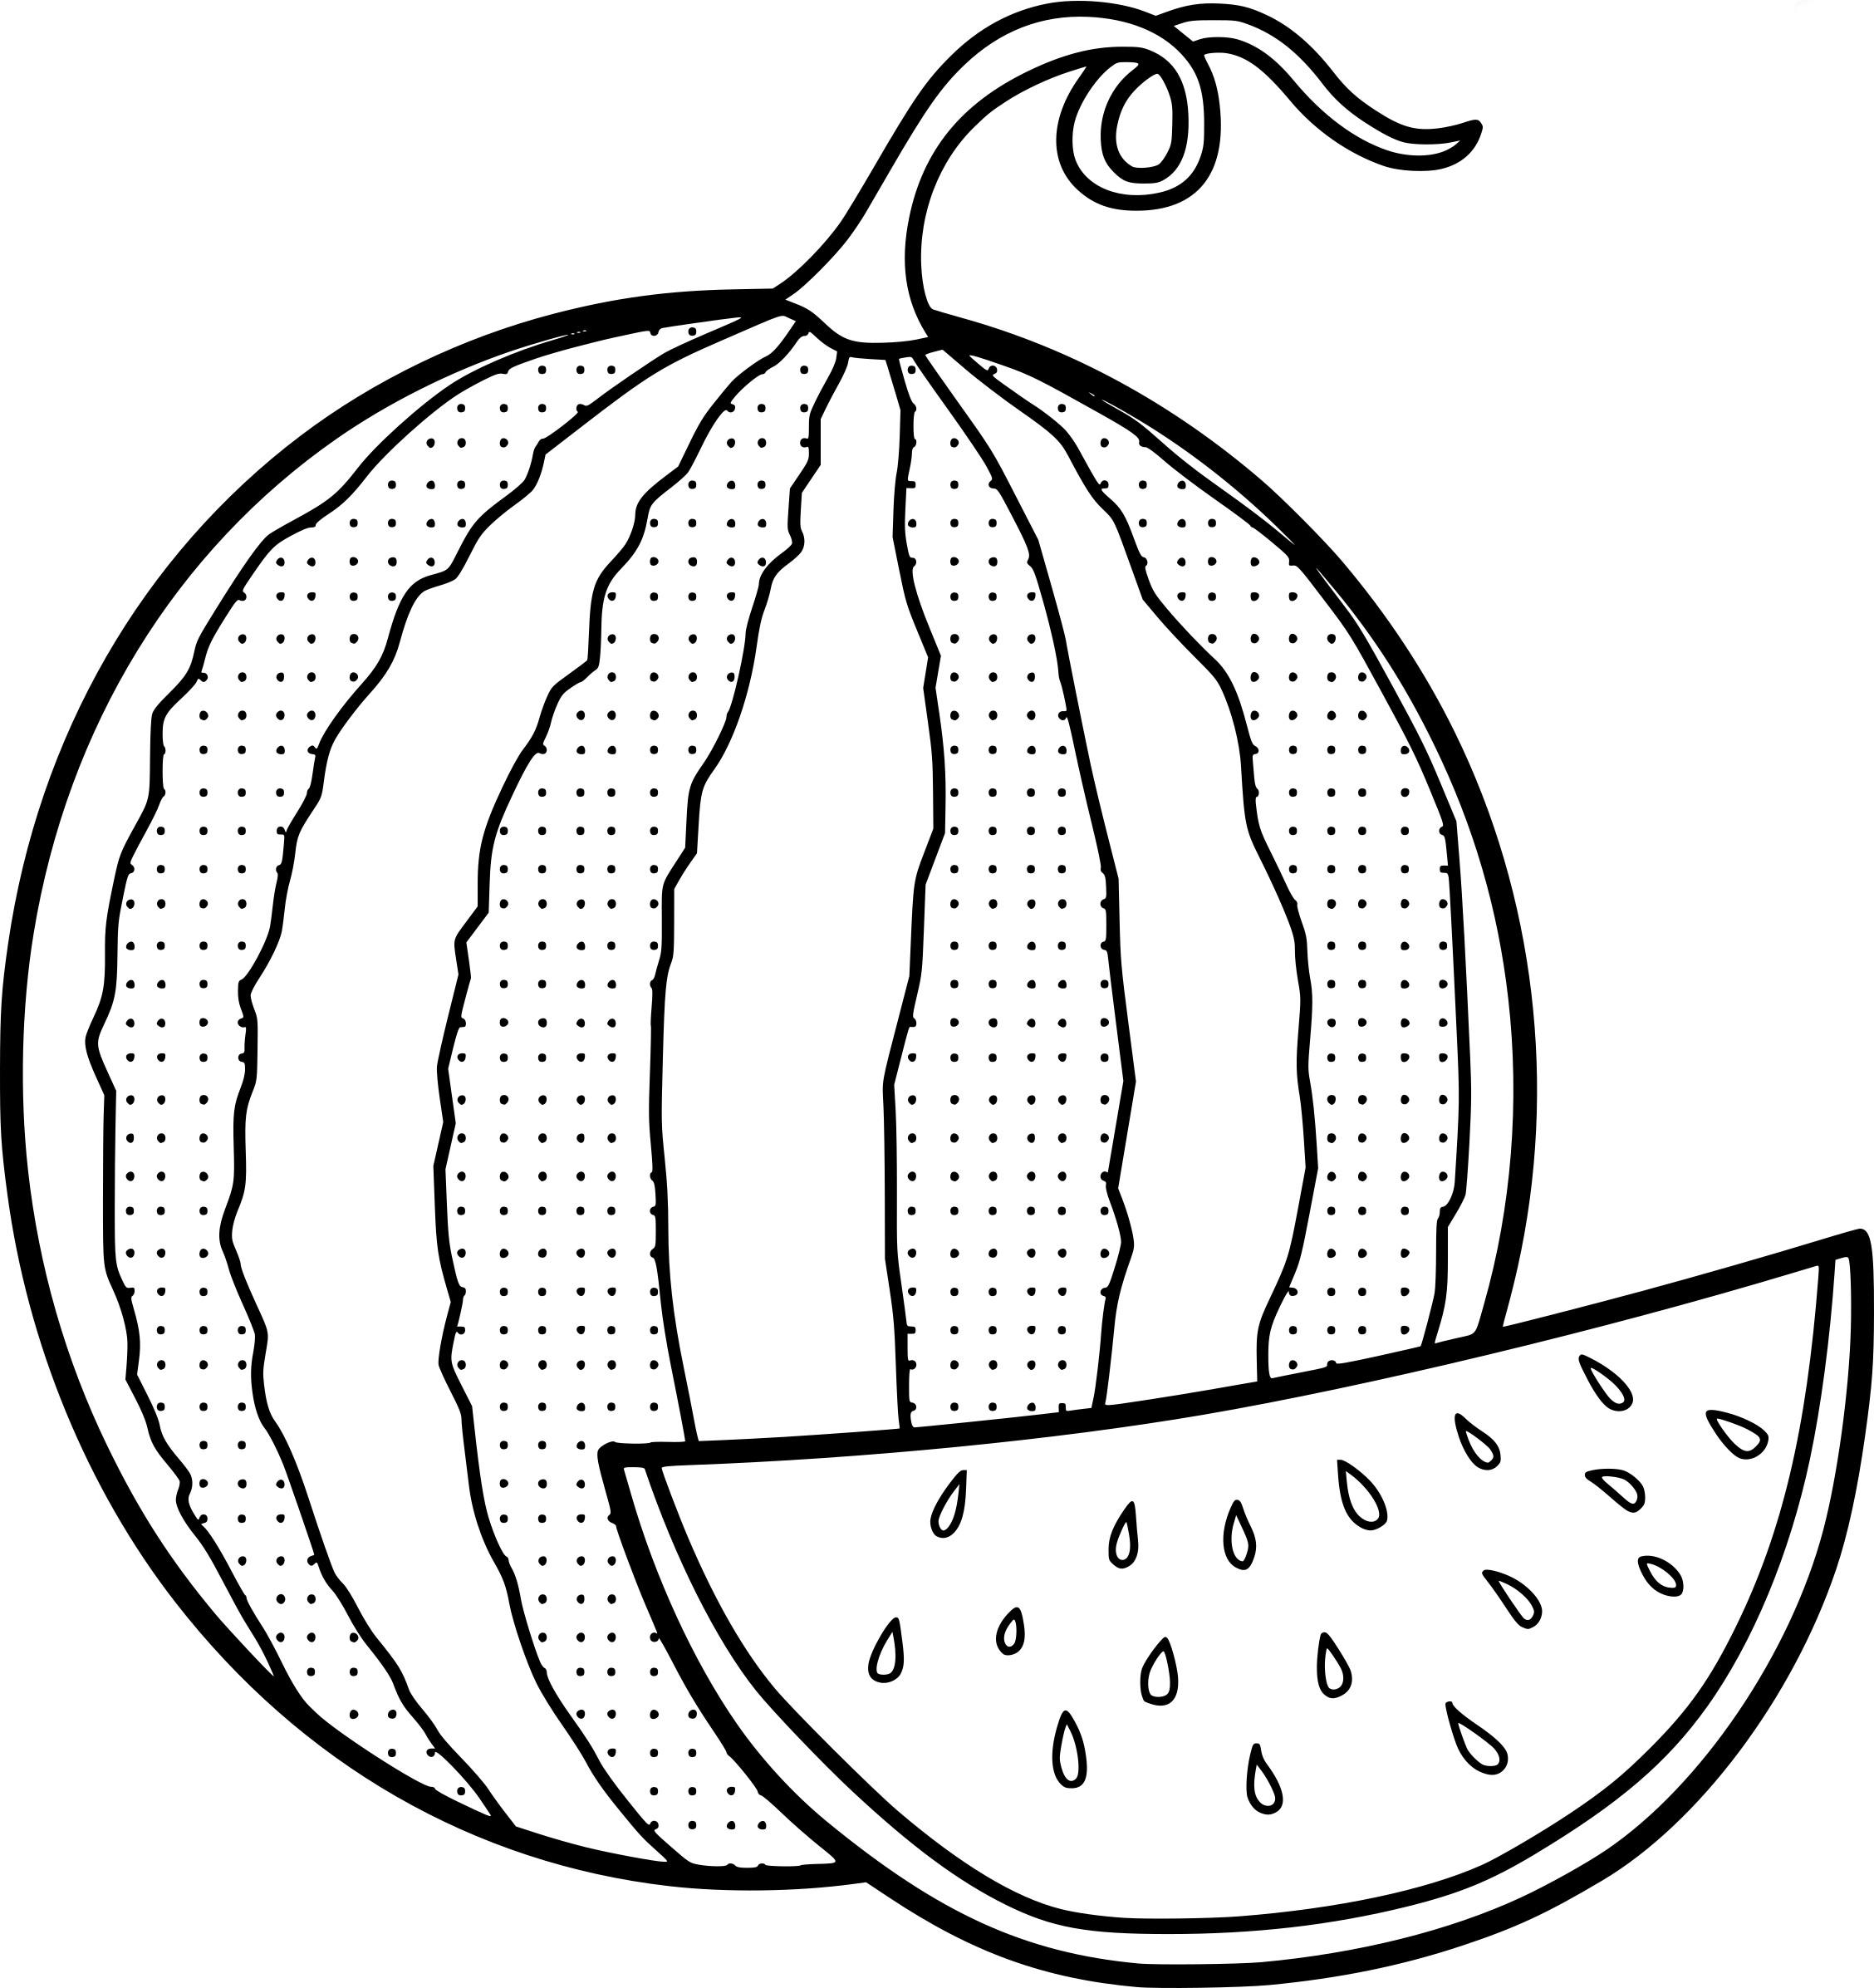 Watermelon Drawing At Getdrawings